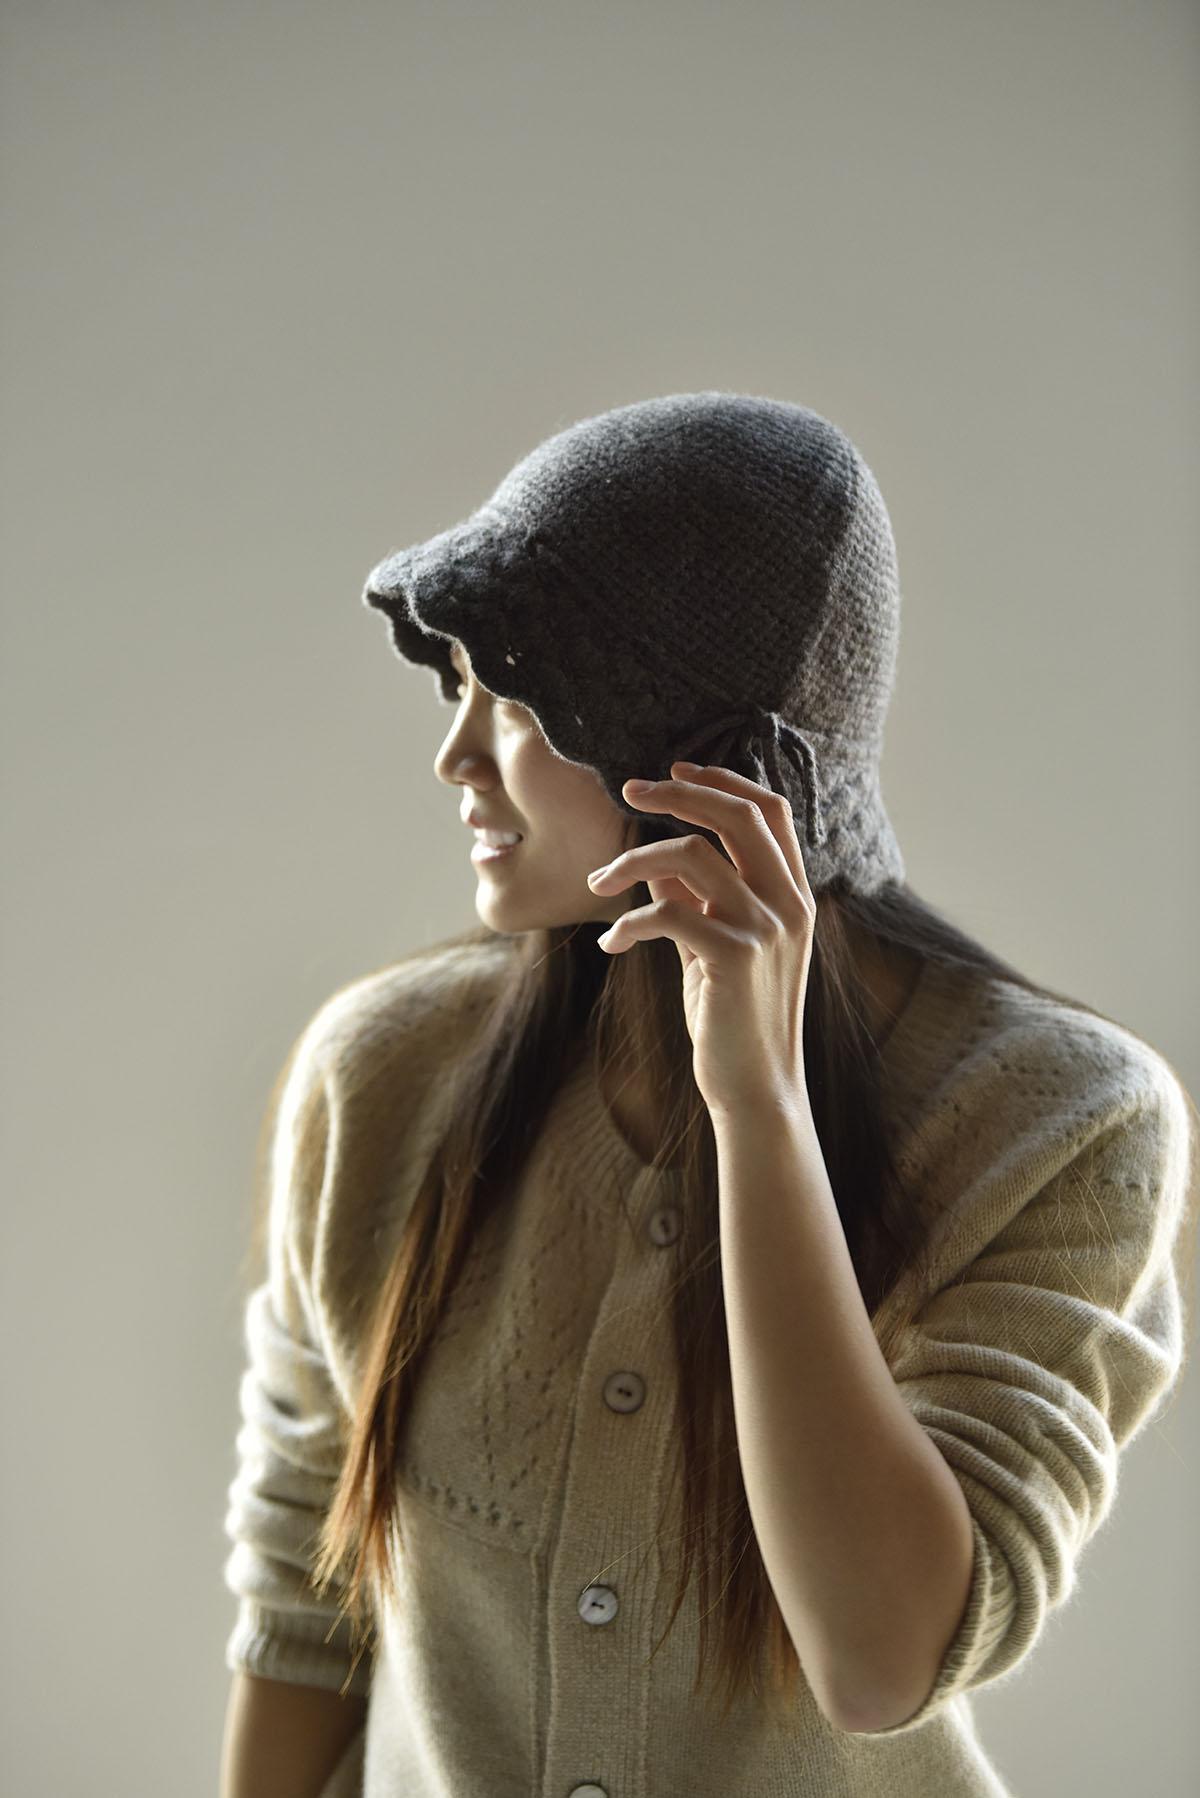 apcshop2021新品推荐 时尚花边百搭绒尖针织保暖纯山羊绒女士帽子